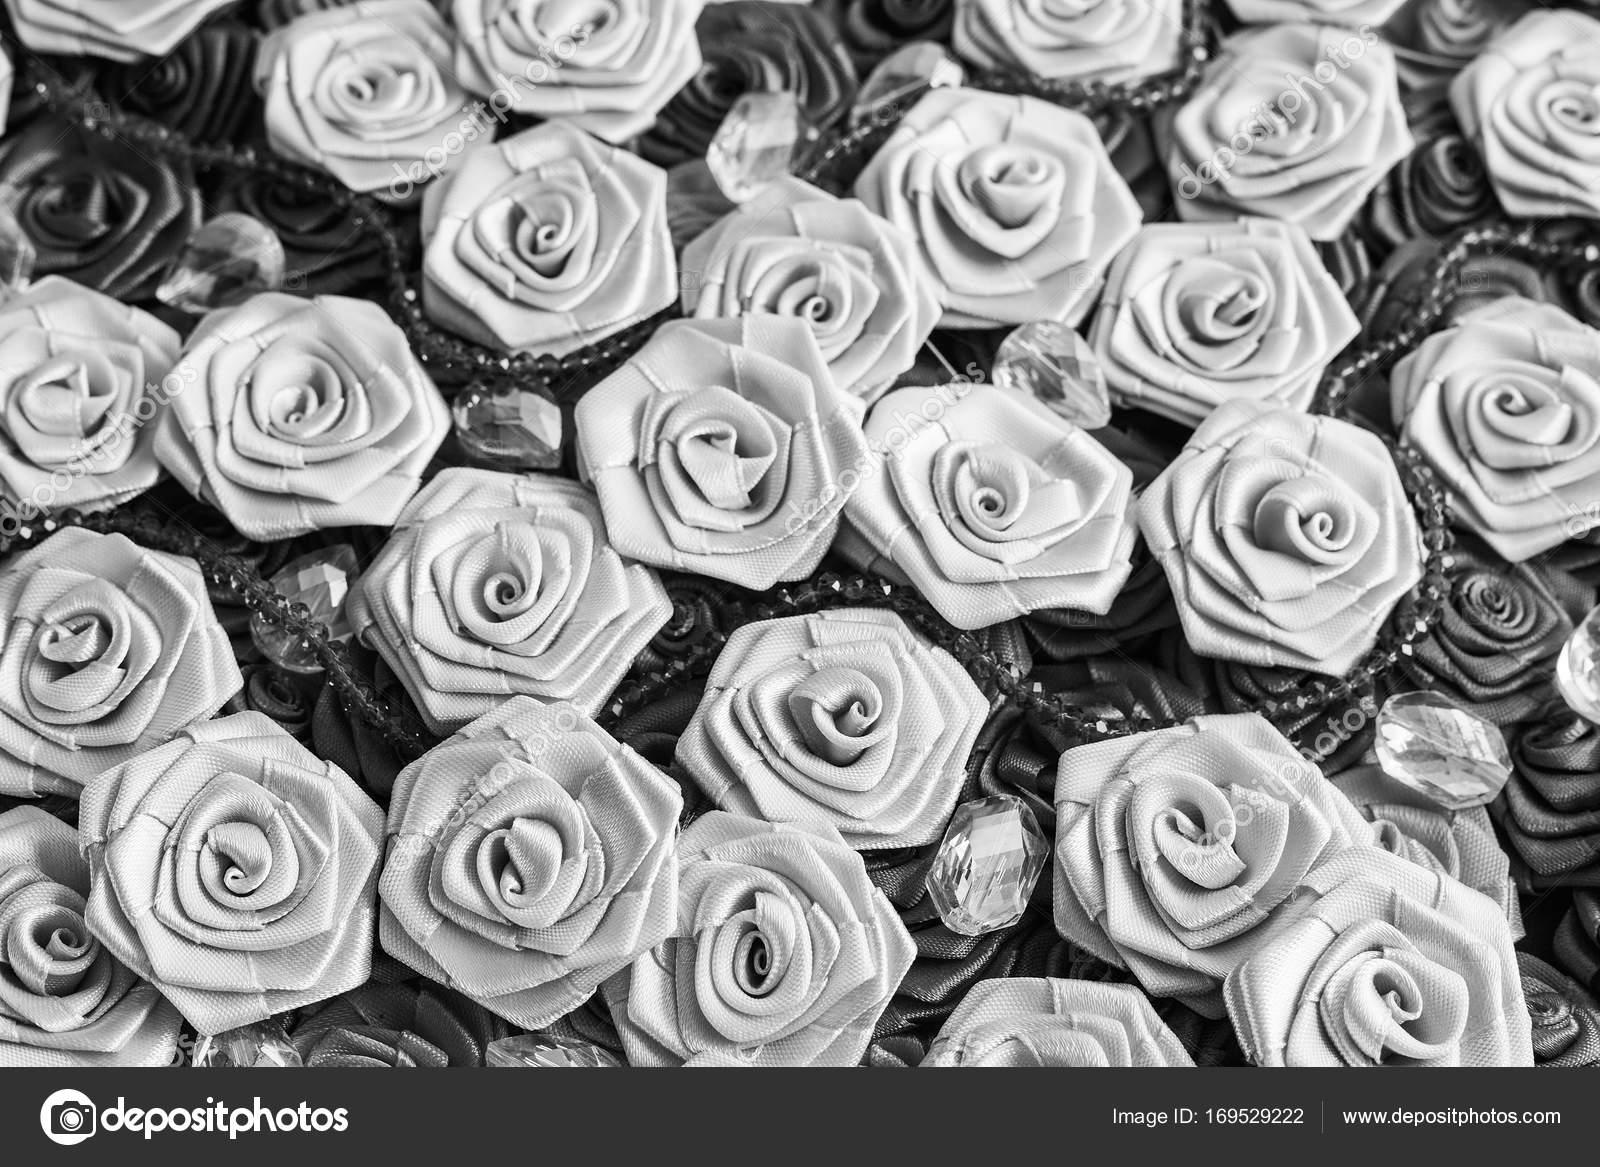 Succulent Tattoo Ideas Black And White Satin Roses Background Wedding Style Background Fashion Manufacturing Ideas Stock Photo C Fotomirta 169529222